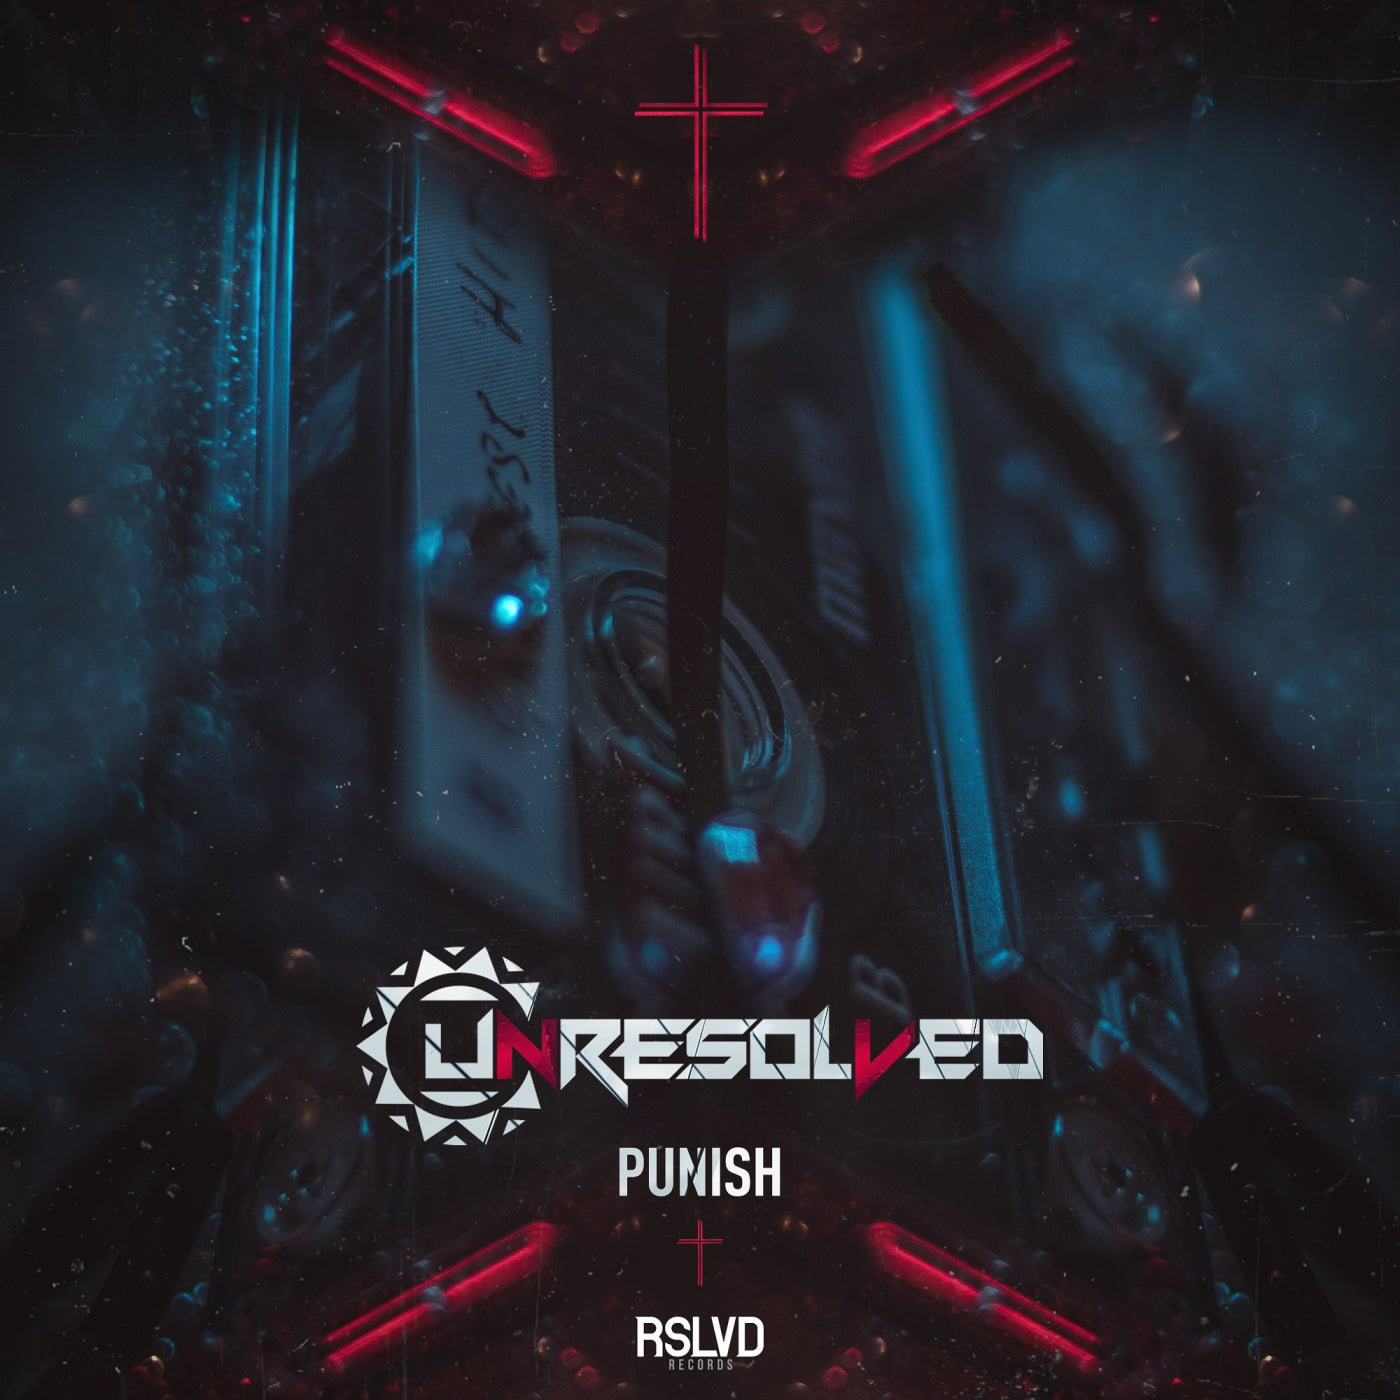 Punish (Extended Mix)